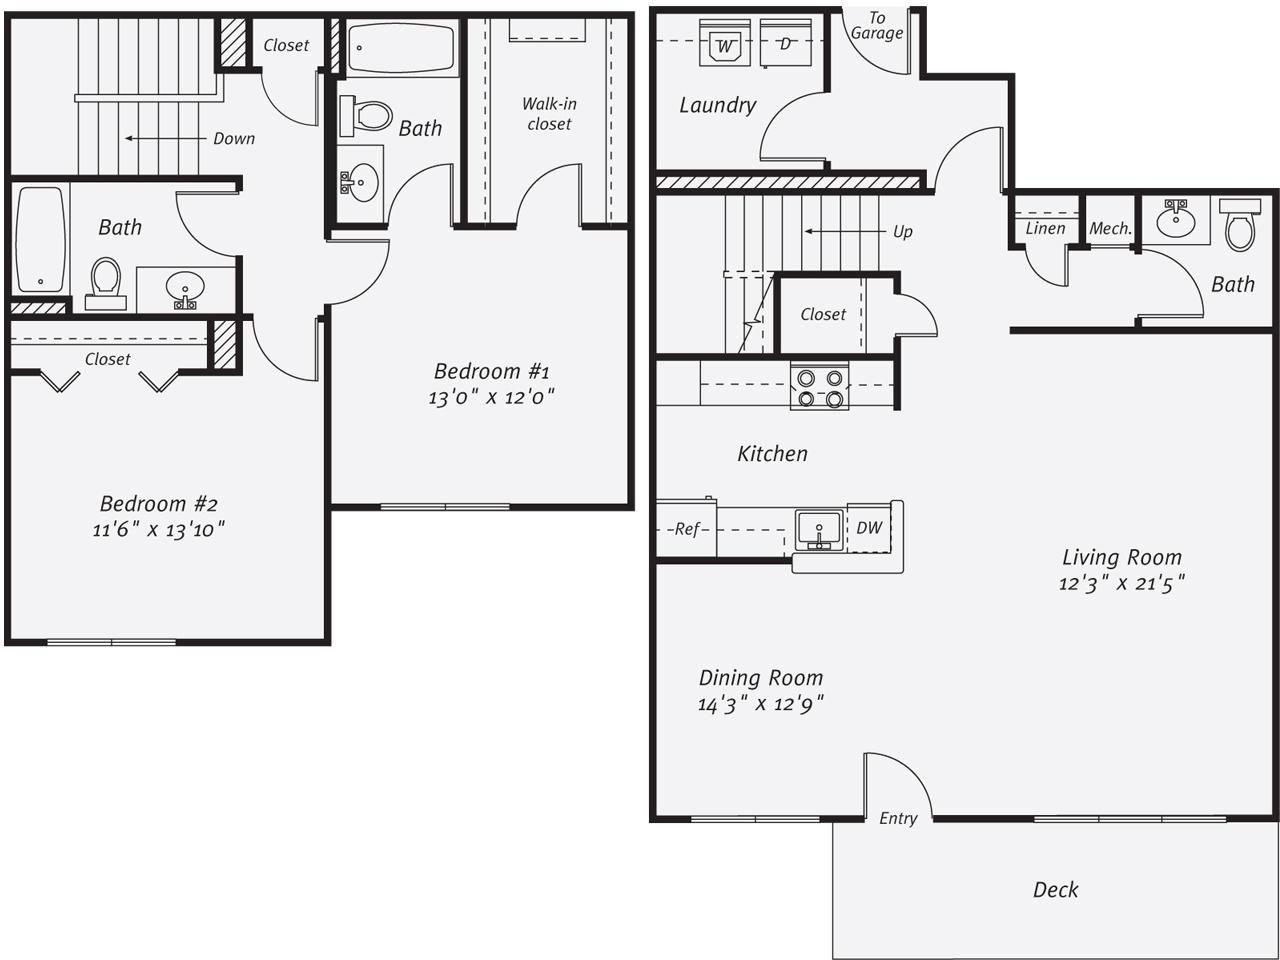 Ny coram thepointatpineridge p0571769 ny014 bt14g 2 floorplan